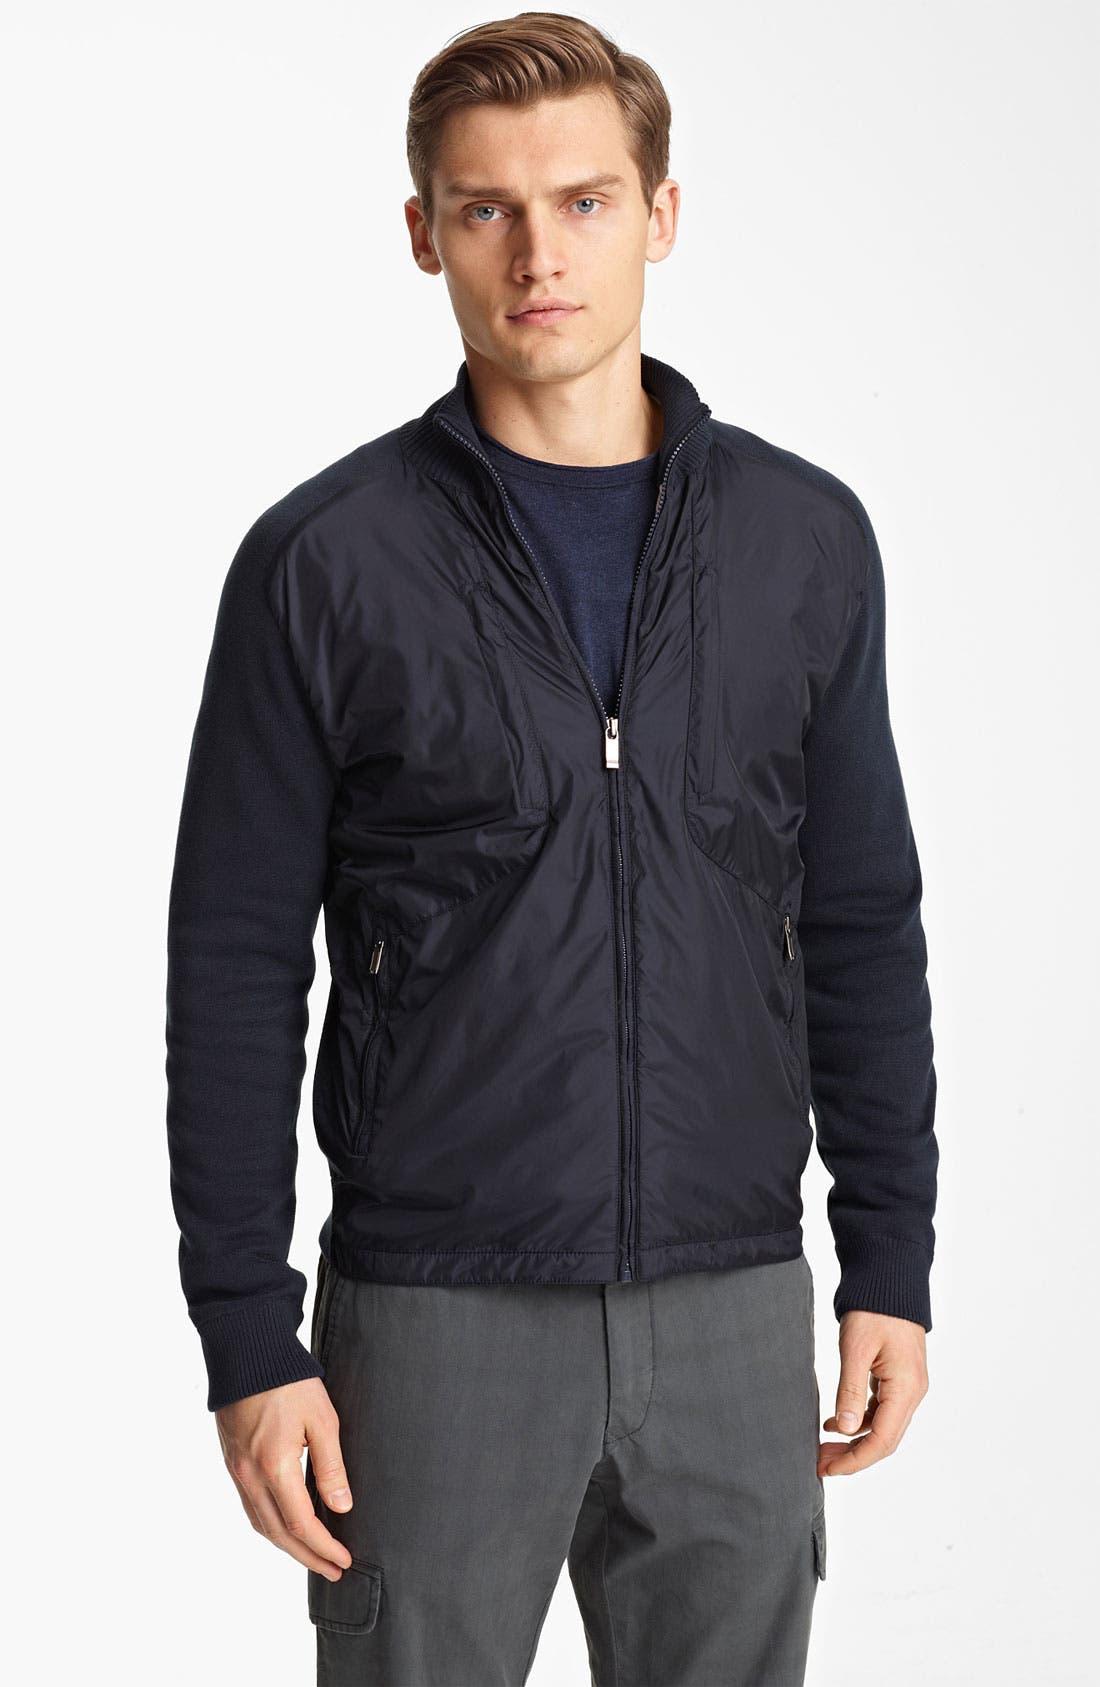 Alternate Image 1 Selected - Zegna Sport Water Repellent Jacket